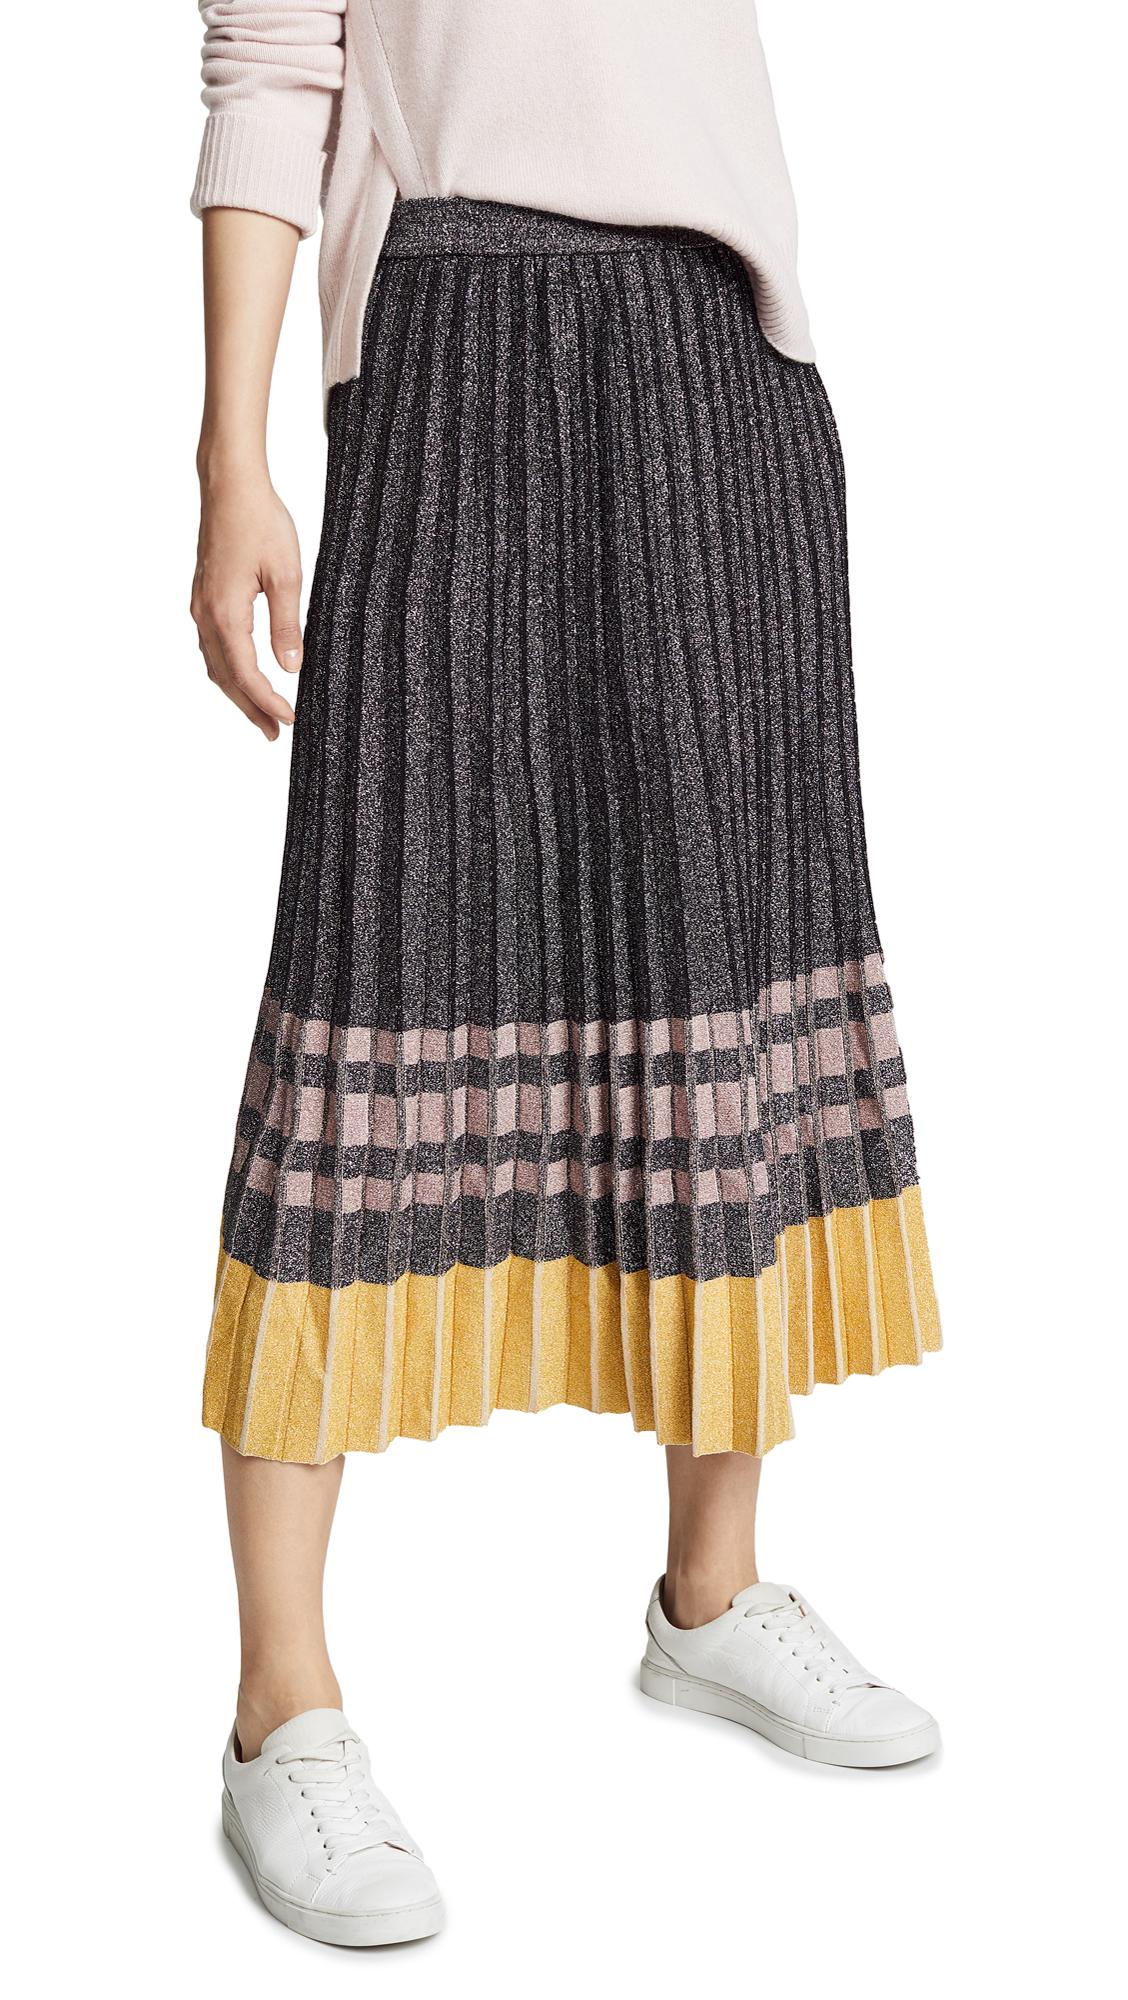 c53f228a41 Derek Lam 10 Crosby Pleated Metallic Knit Skirt   SHOPBOP